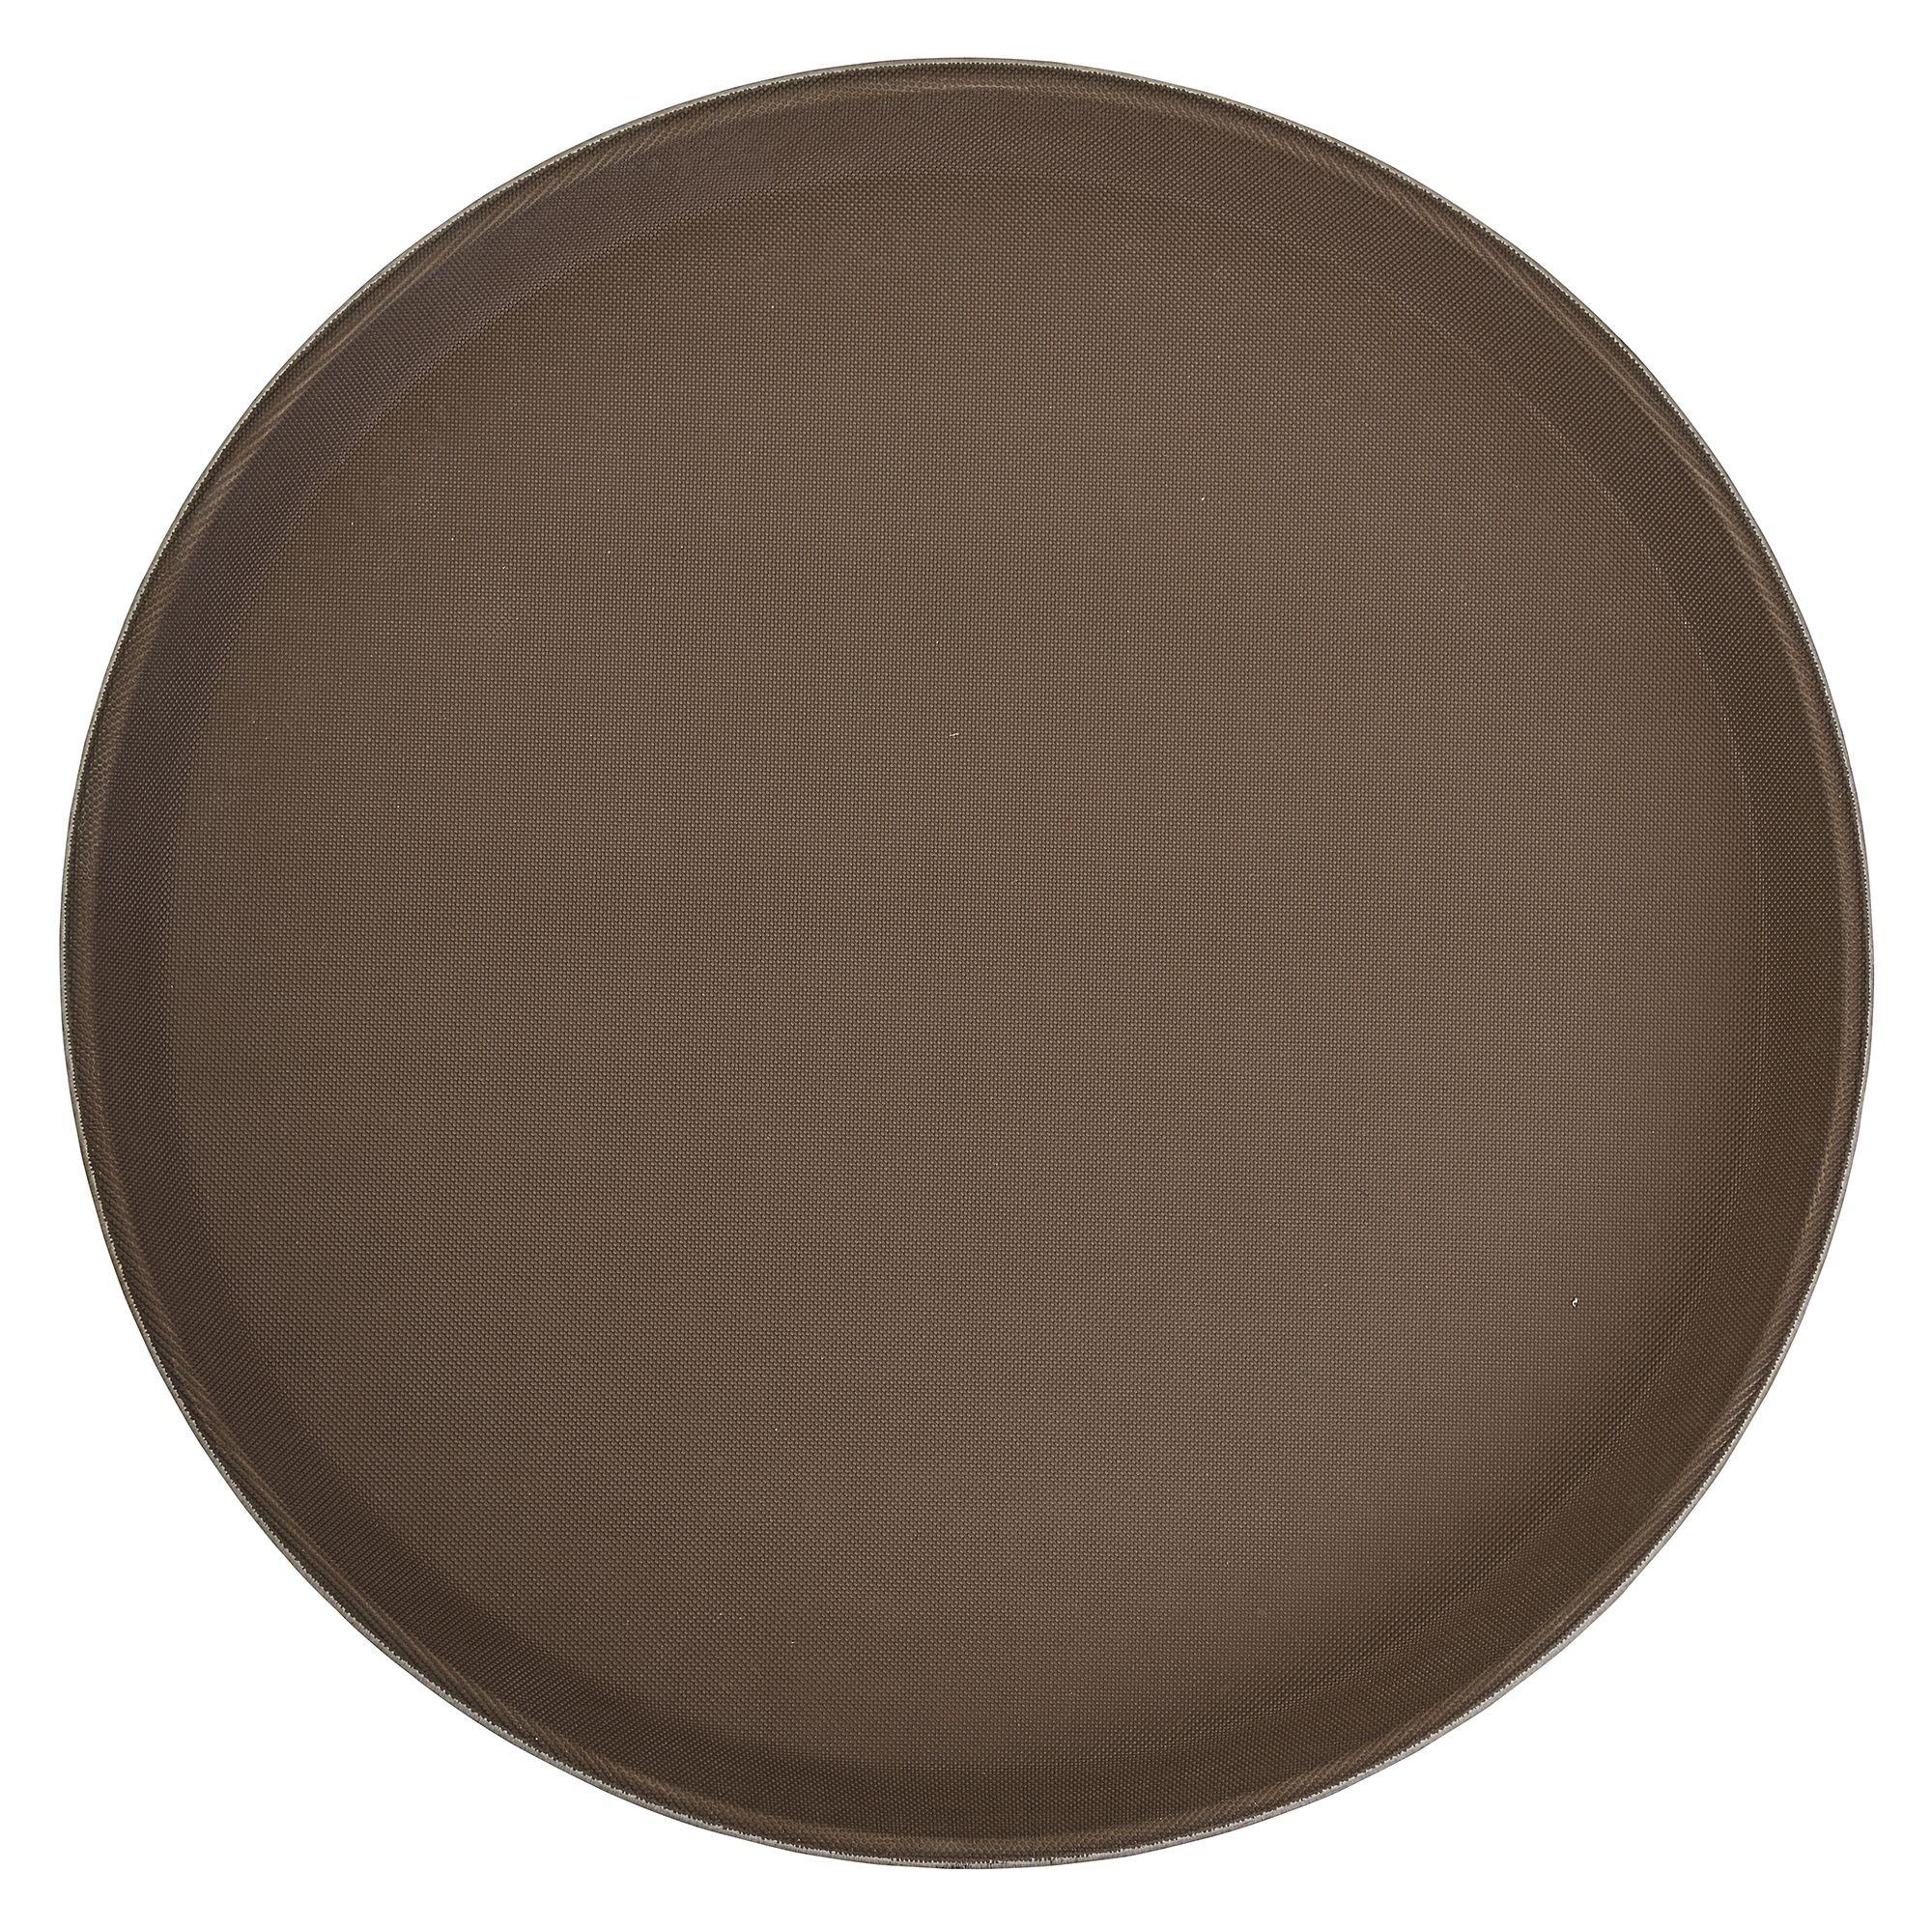 Winco tfg-11n Brown, Round Non-Slip Fiberglass Tray, 11''